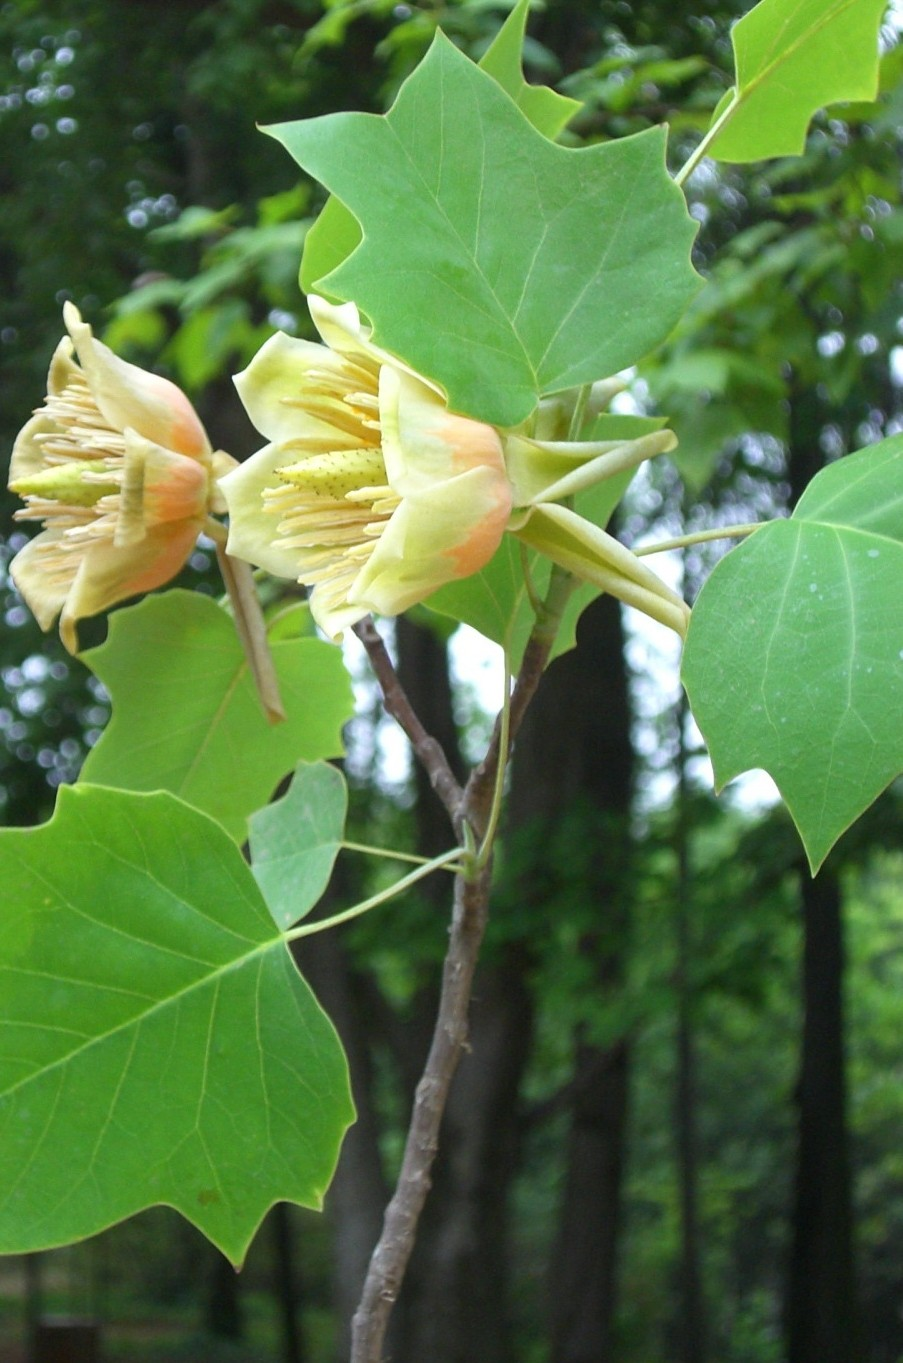 Magnolia family seeds